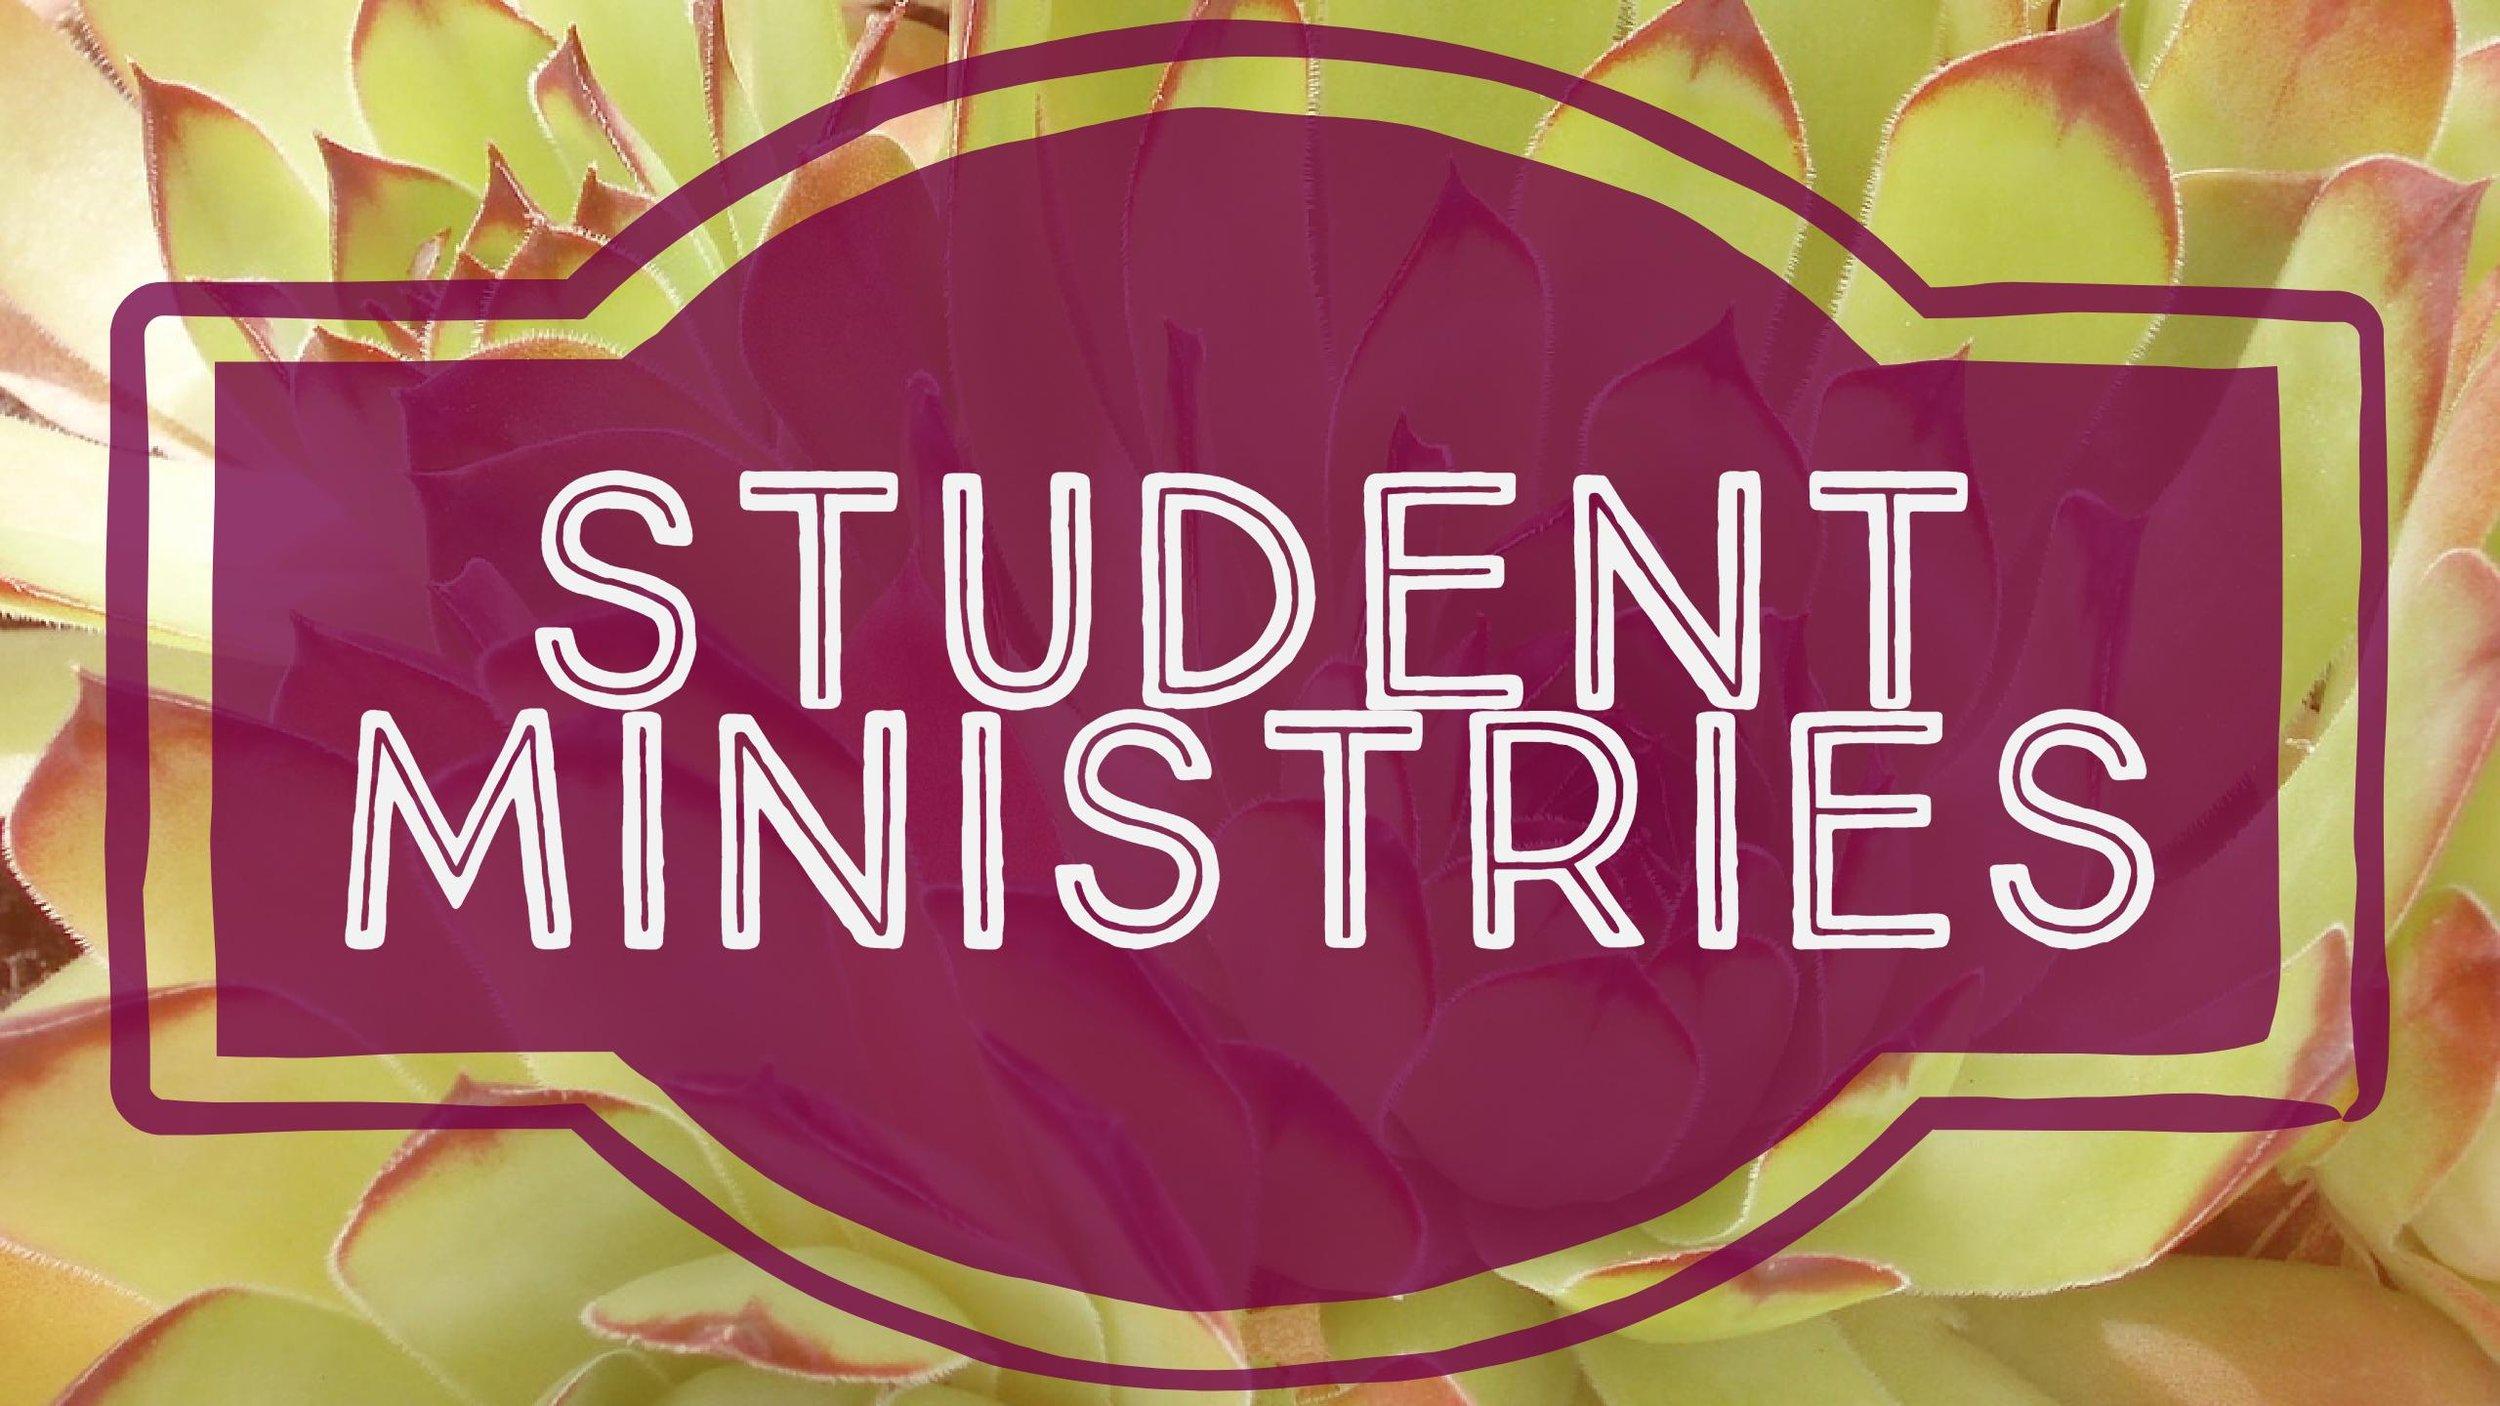 StudentMinistries.jpg